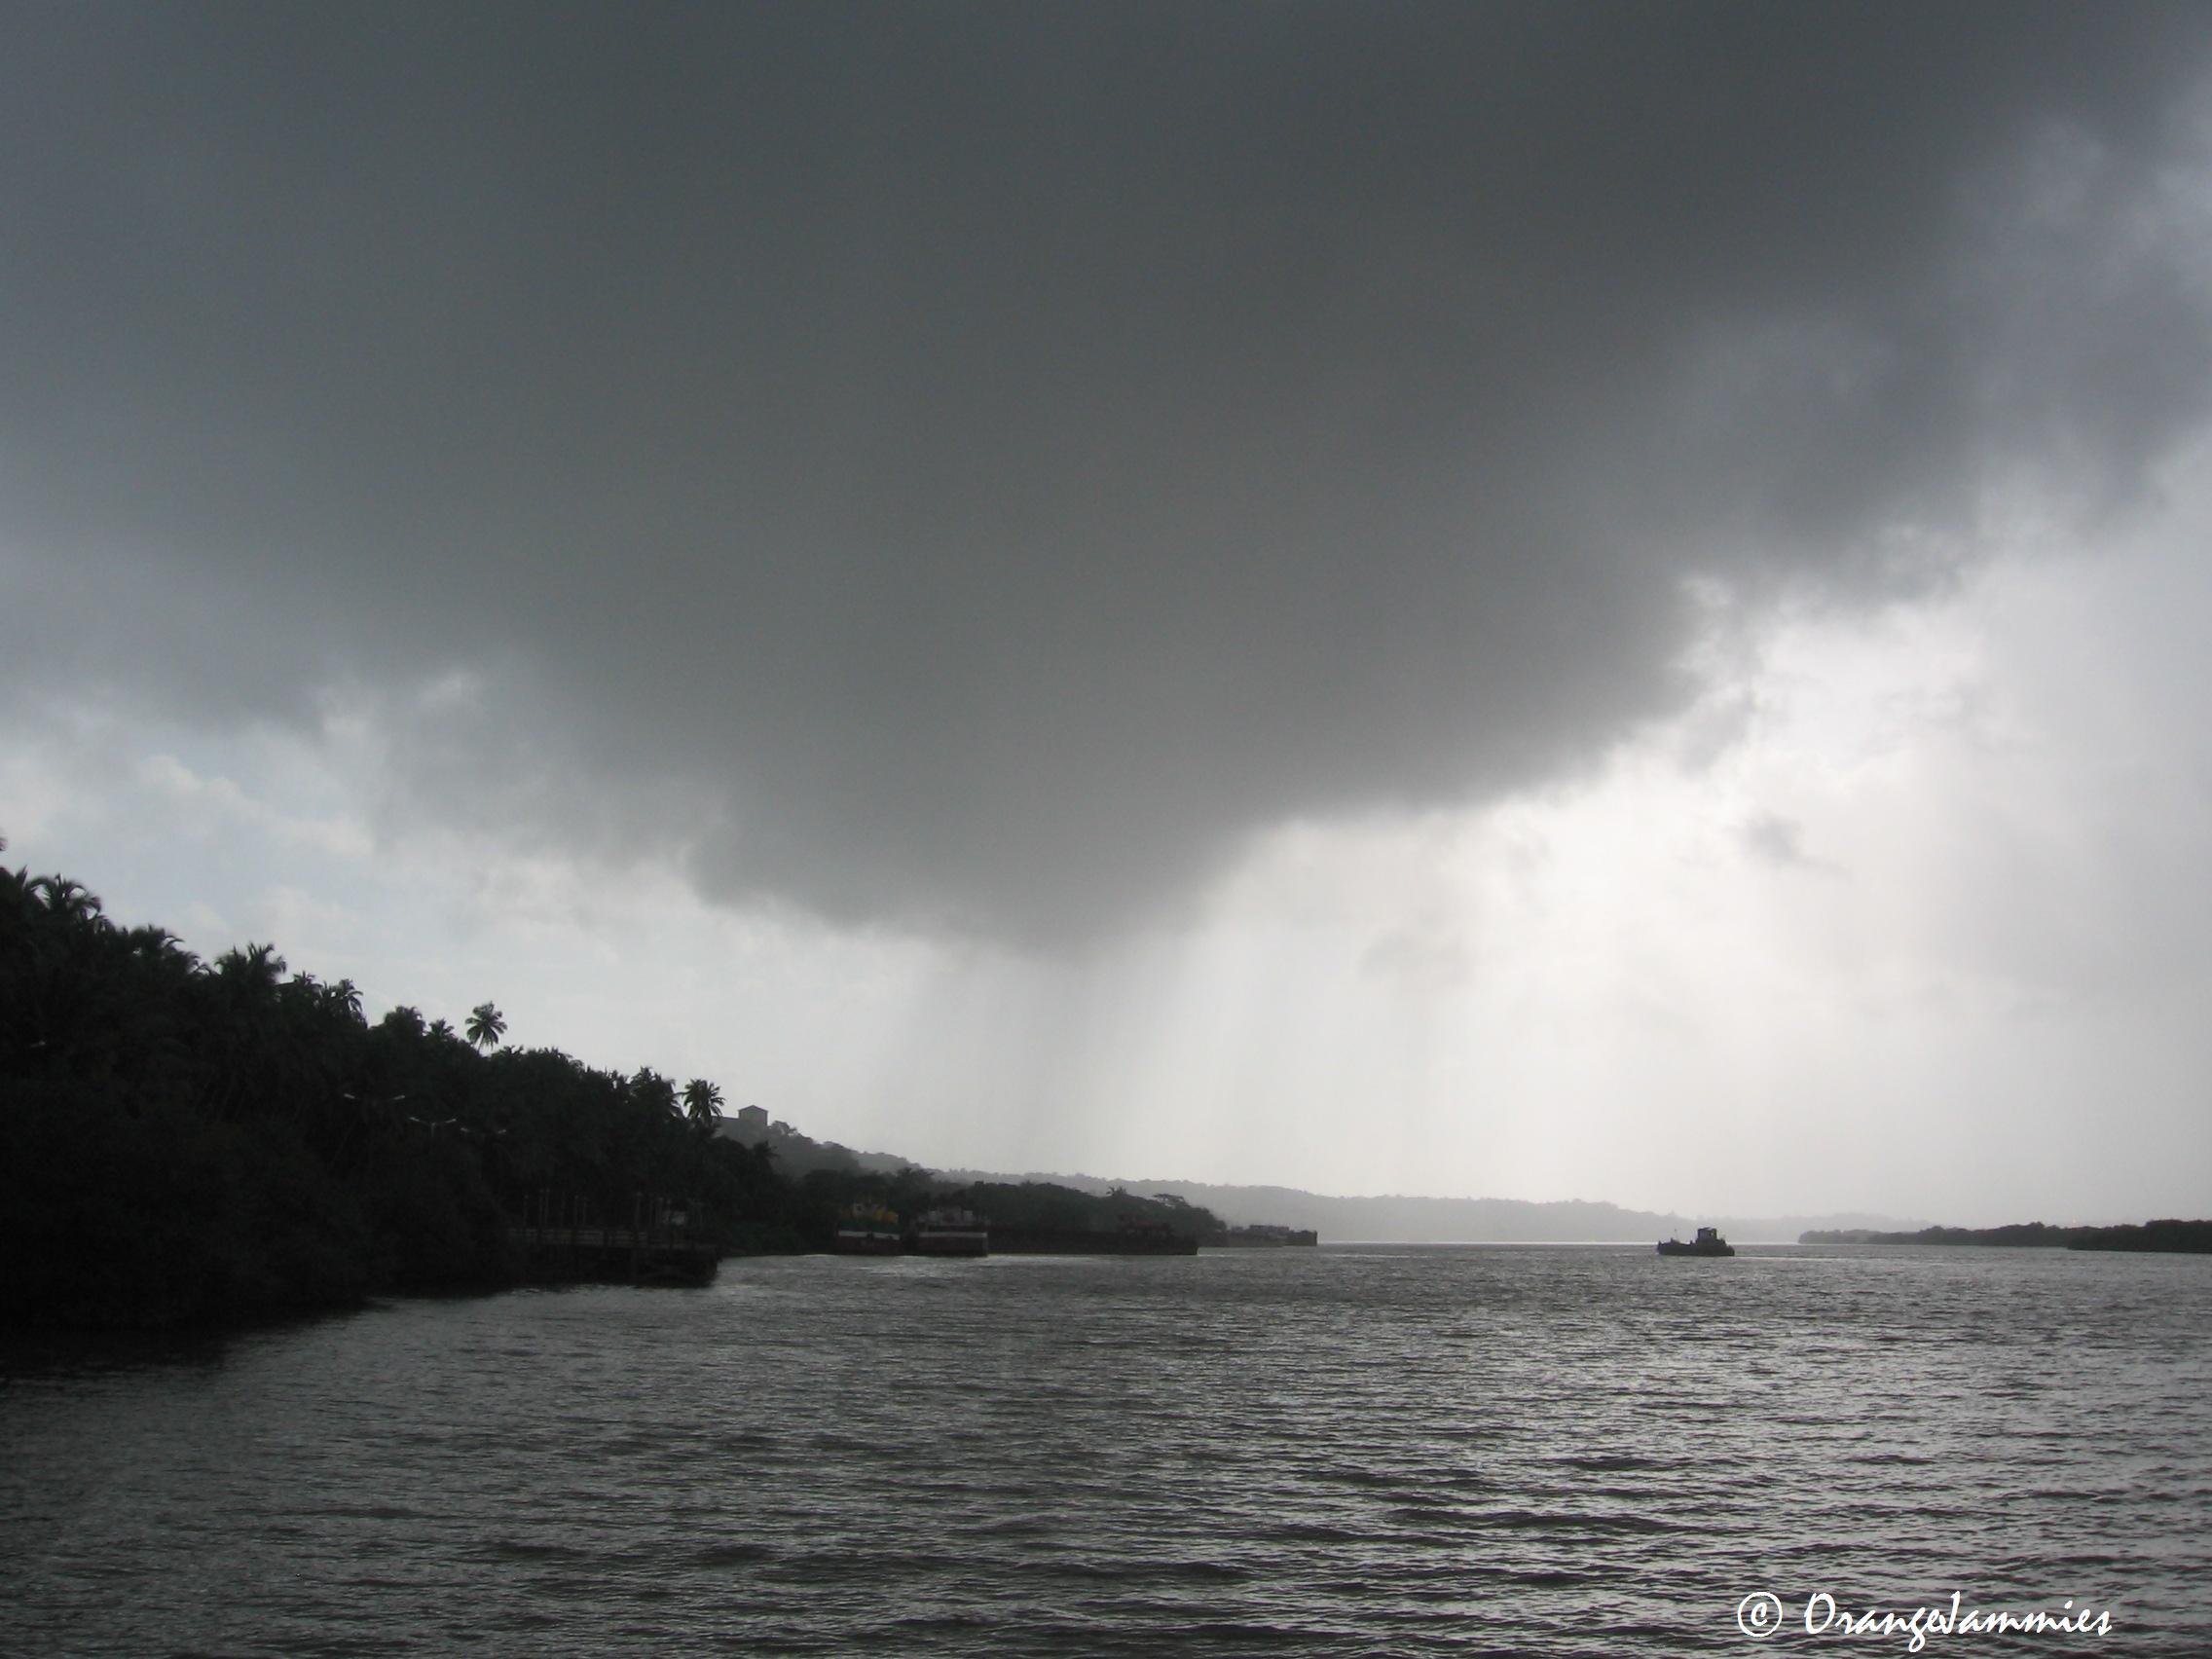 Storm over the Mandovi